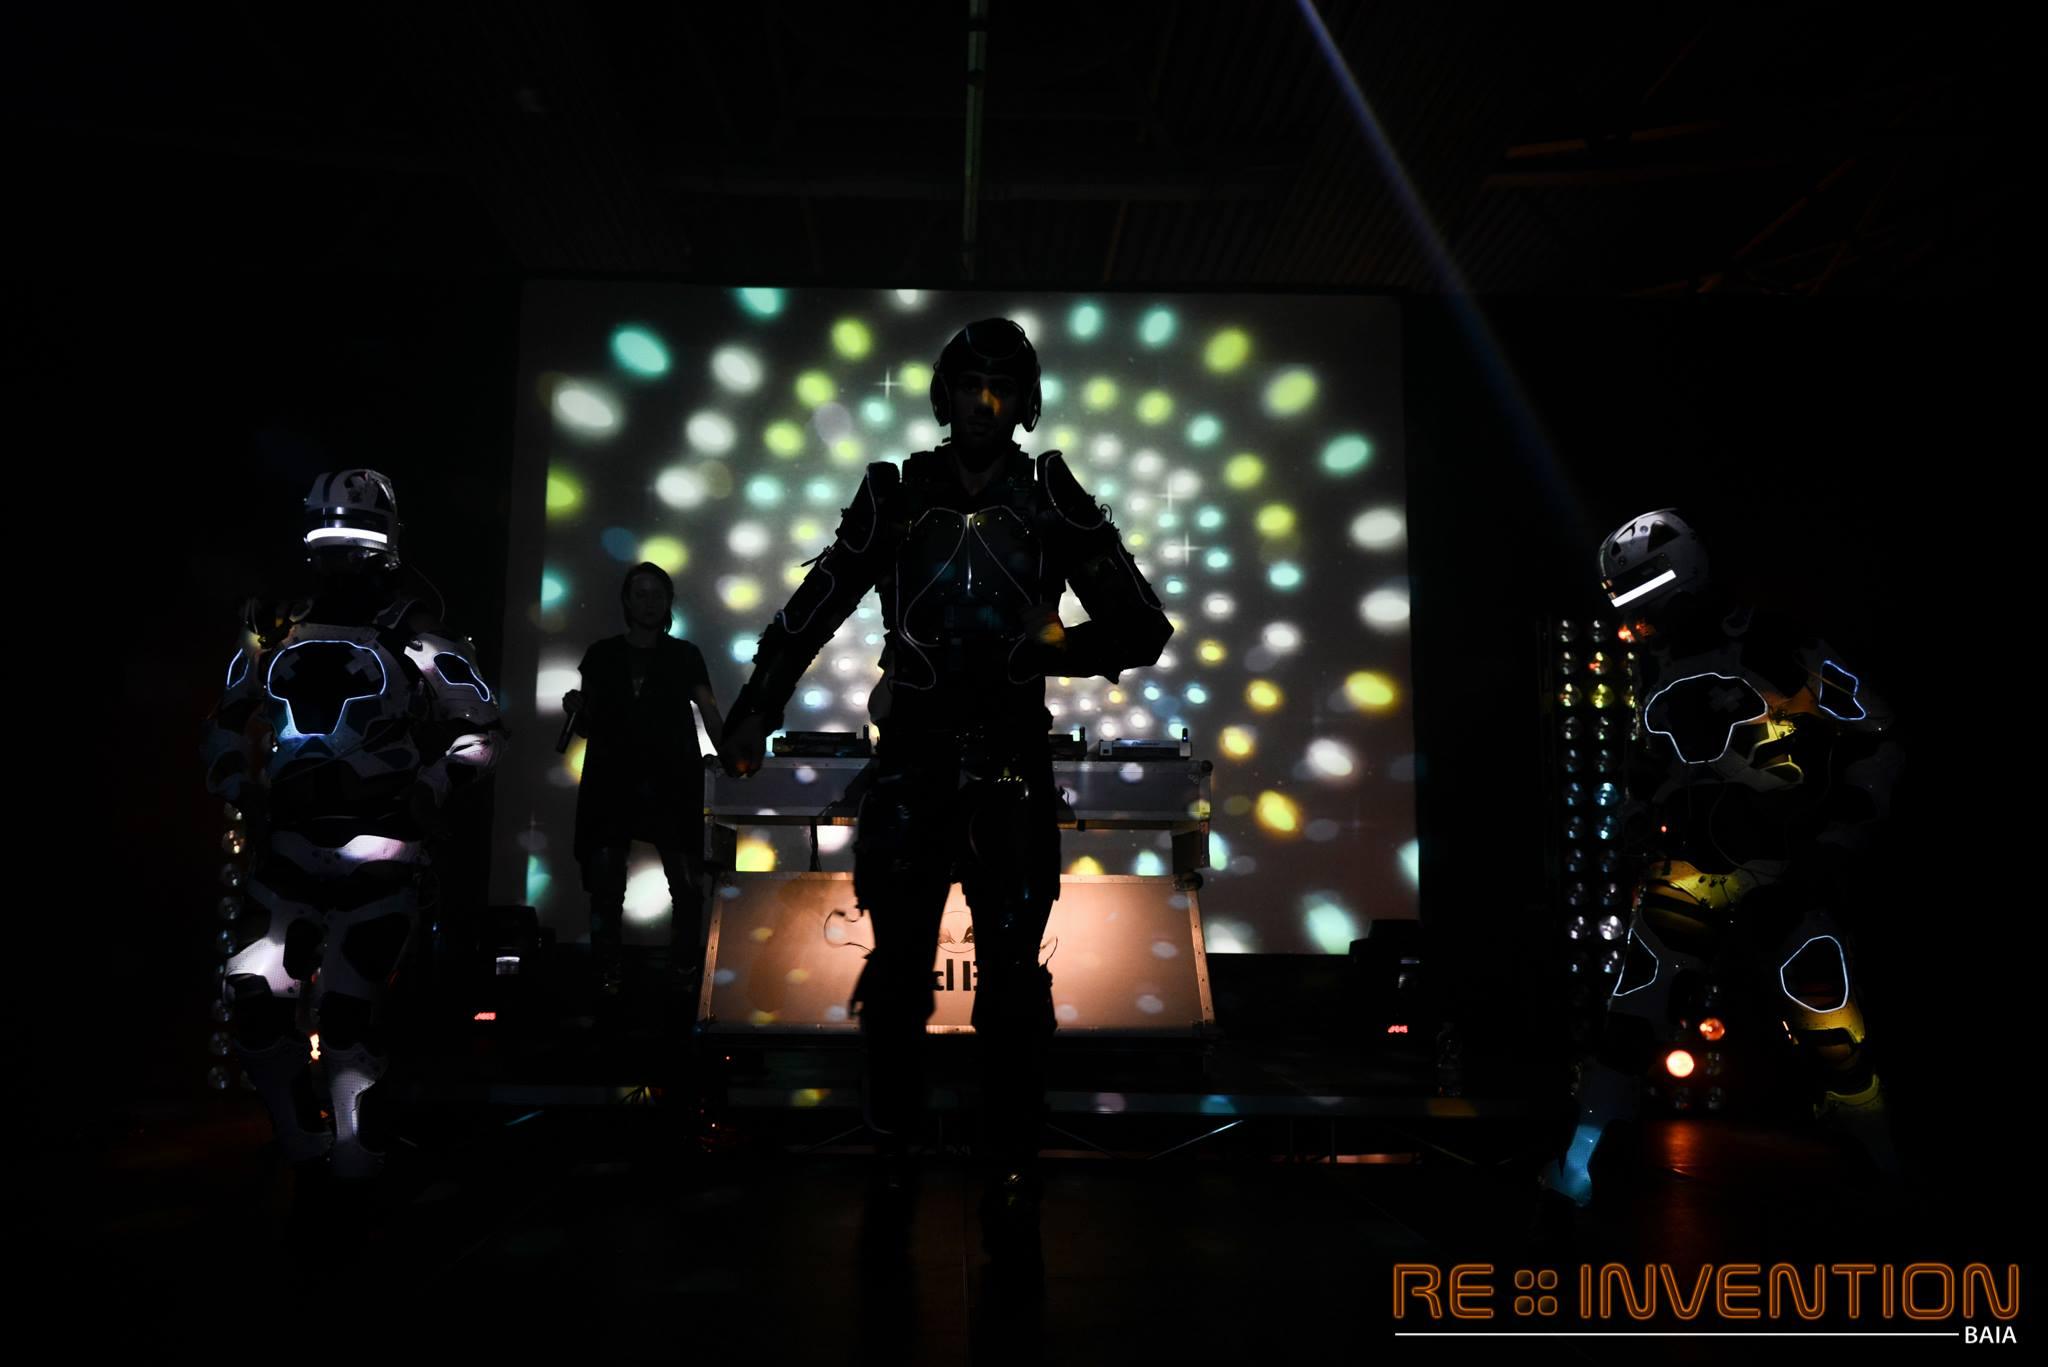 http://lnx.mirkone.it/wp-content/uploads/2015/12/mirk_one_re-invention-6.jpg